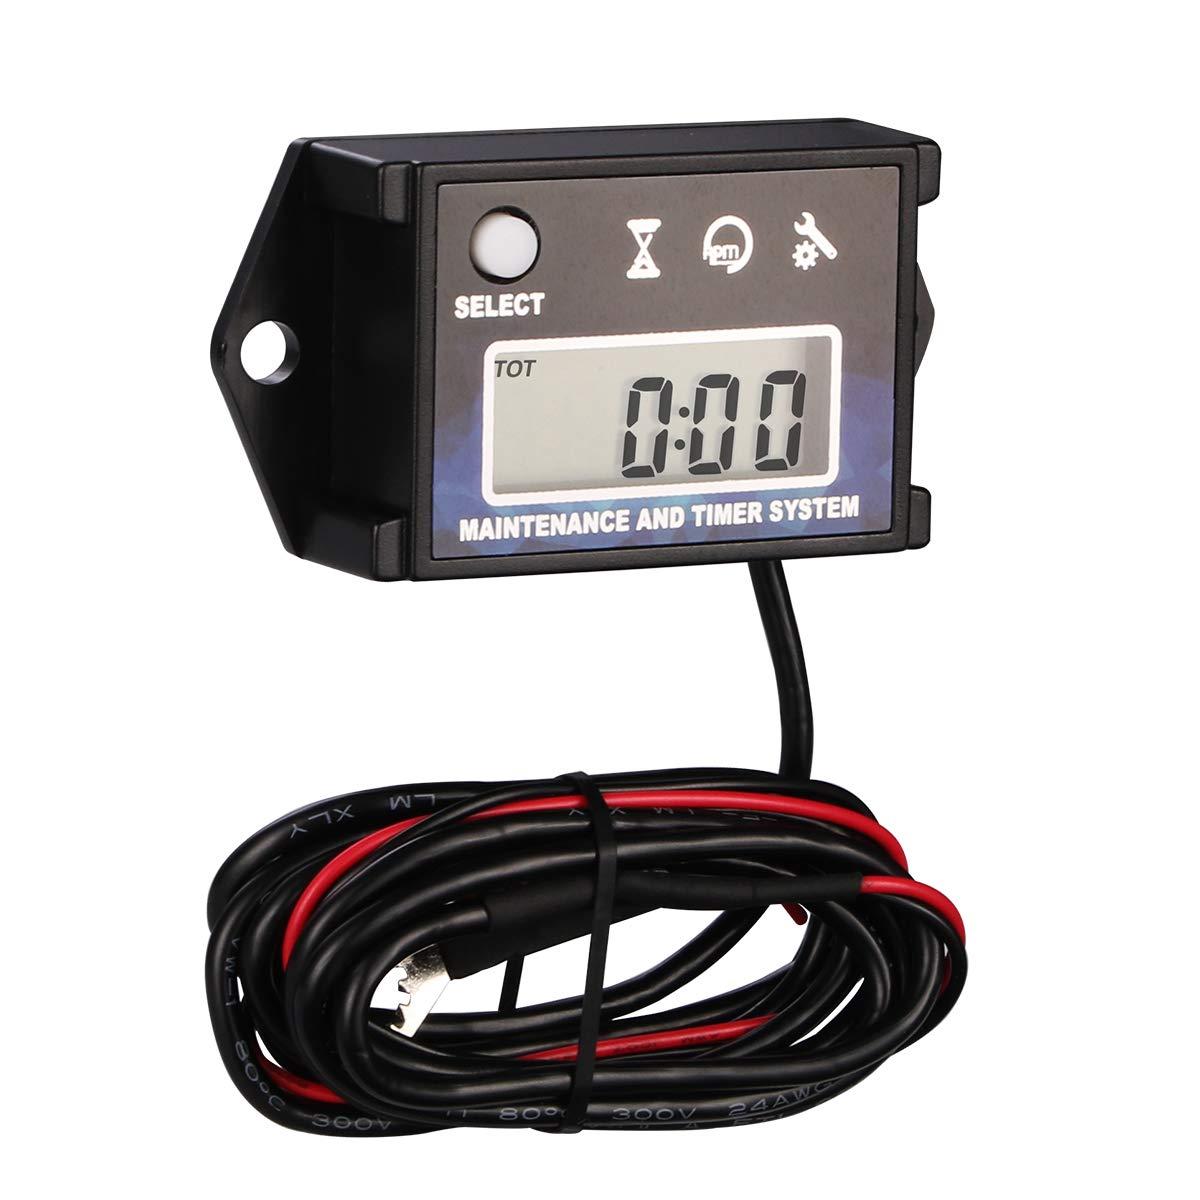 Digital Tach Maintenance Hour Meter Tachometer RPM for Lawn Mower Generator Boat Outboard ATV UTV Motorcycle Motocross Dirt Bike.